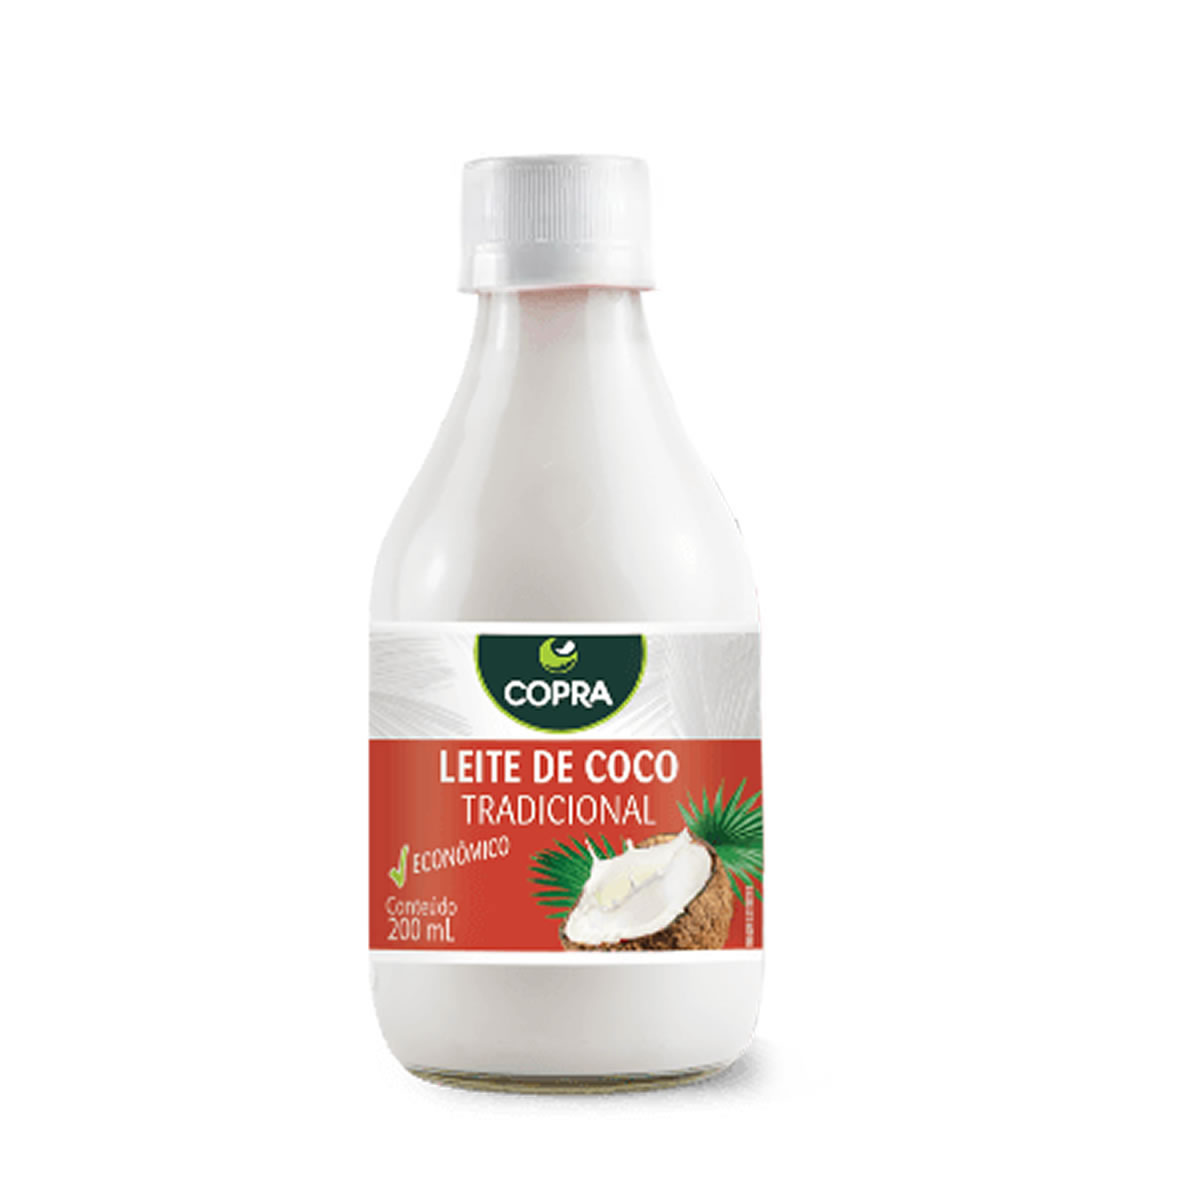 Leite de Coco pet 200ml - Copra